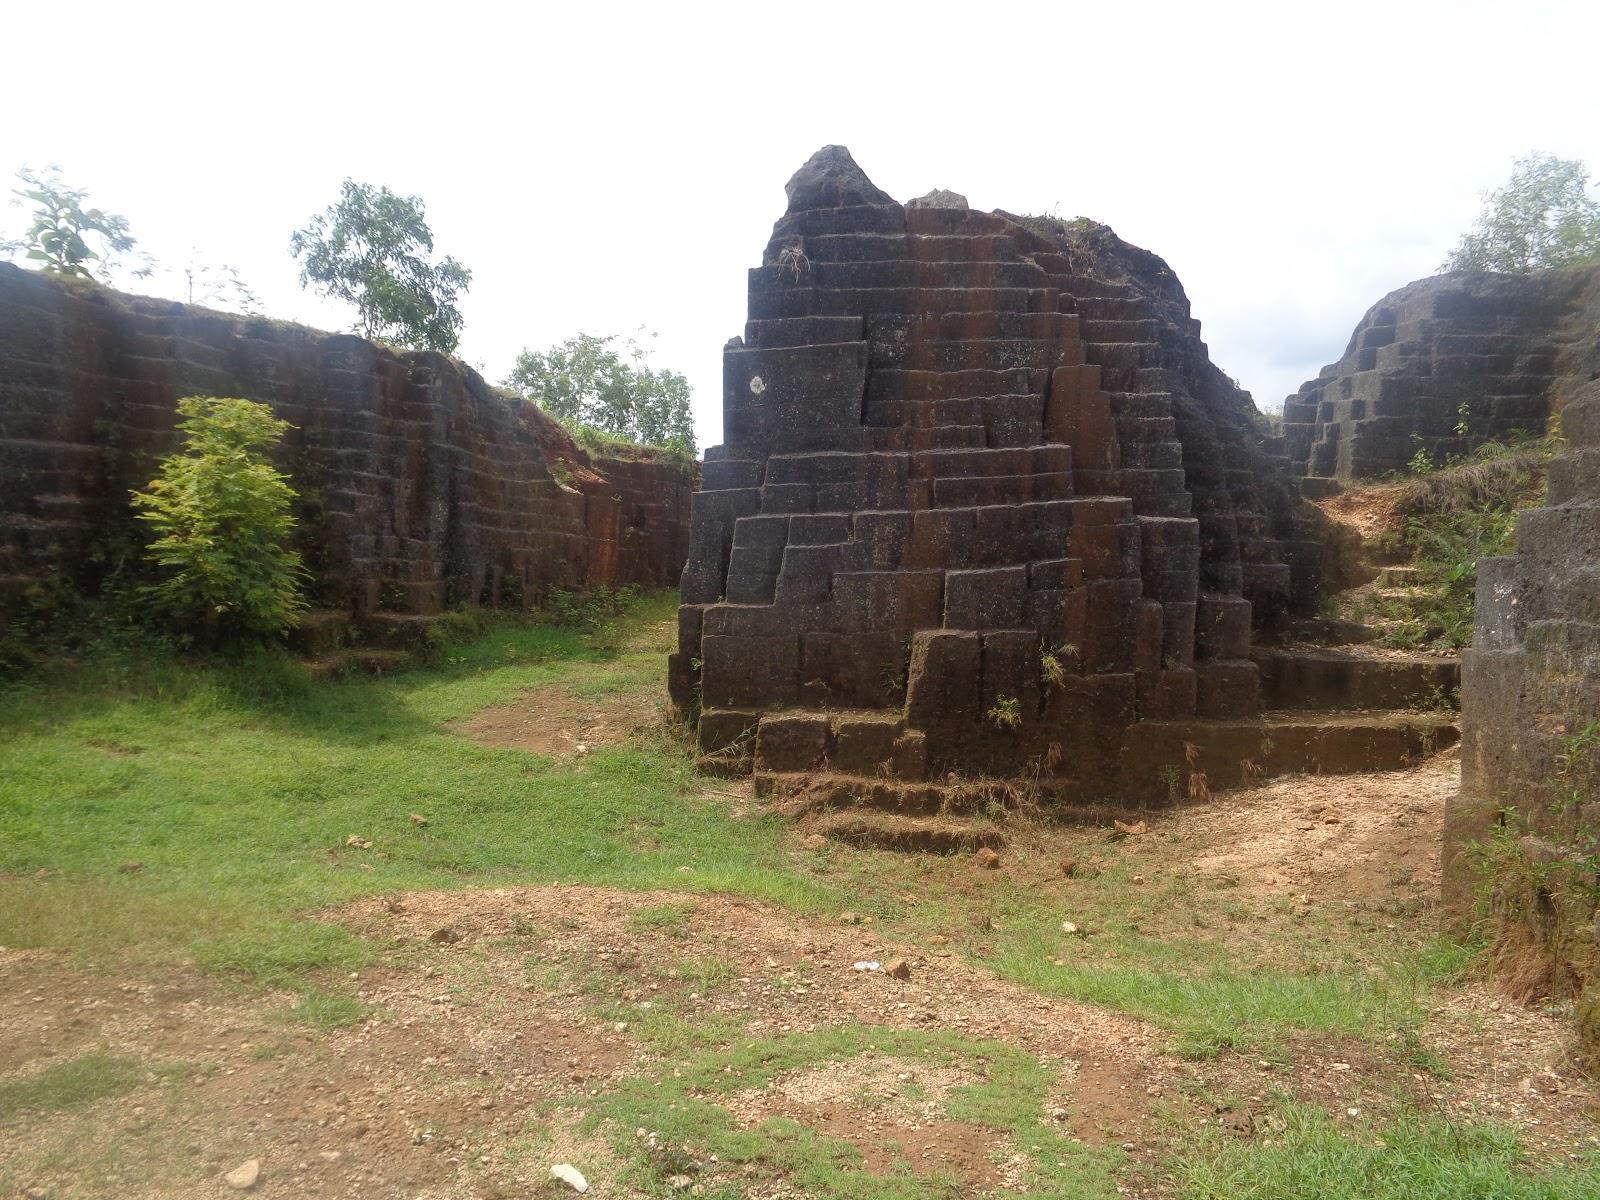 Wisata Watu Giring Yogyakarta Tempat Foto Pre Wedding Selfie Menarik